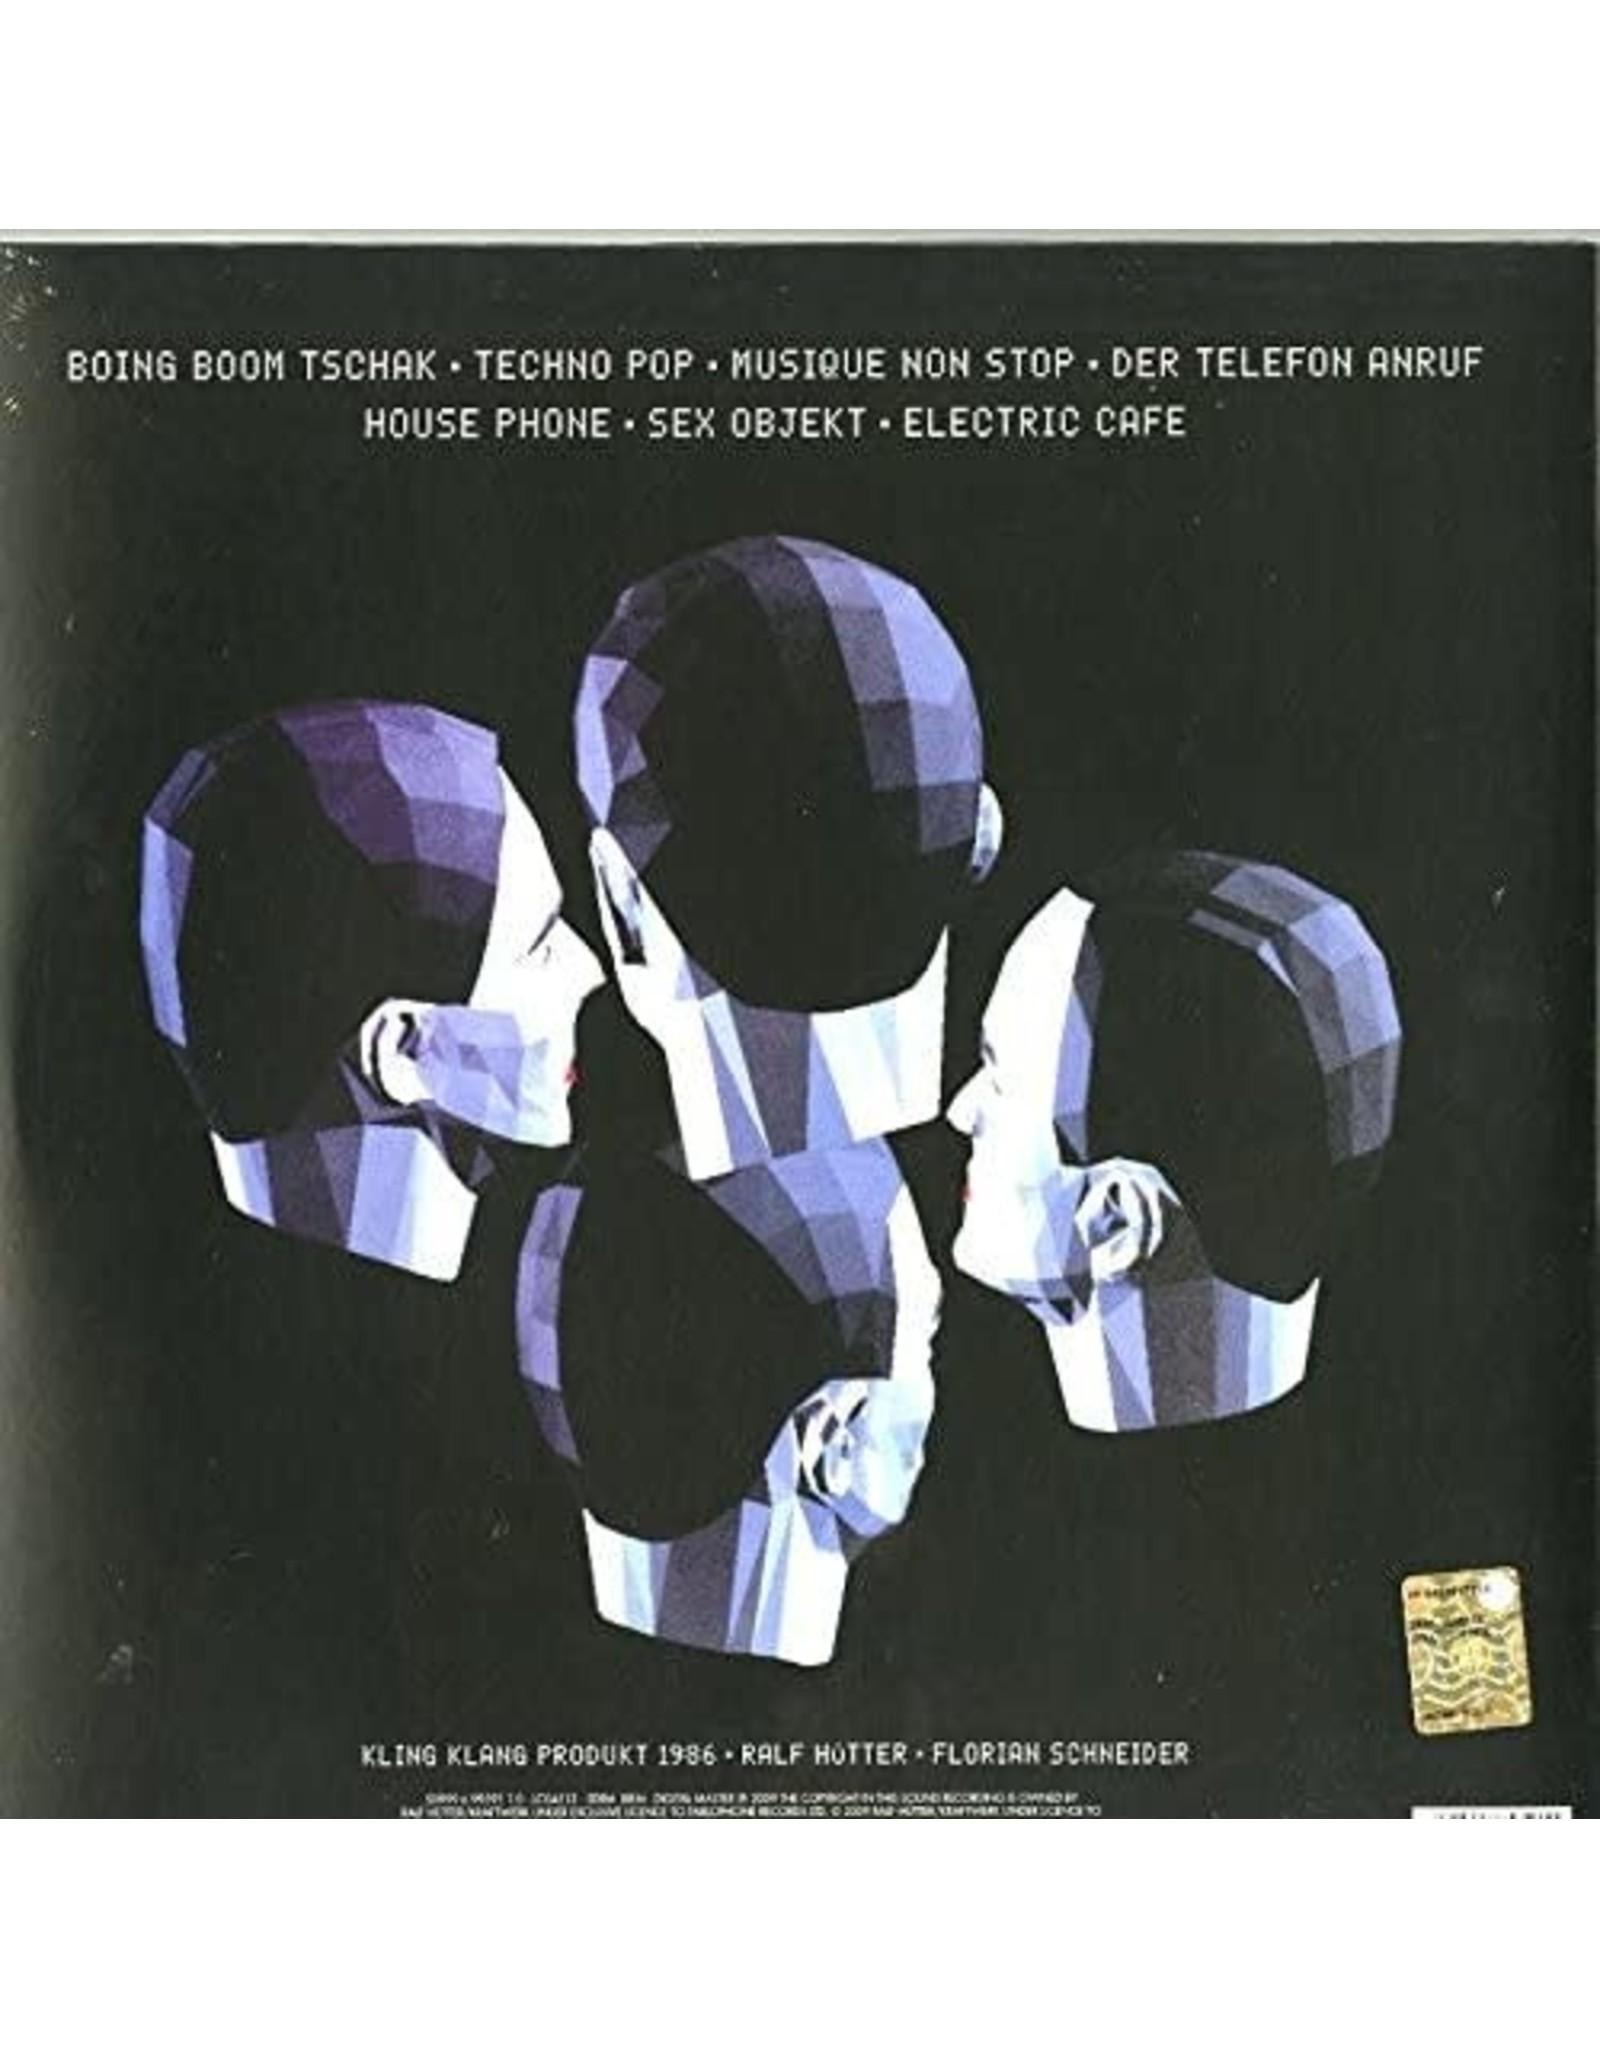 Kraftwerk - Techno Pop (Silver Vinyl)